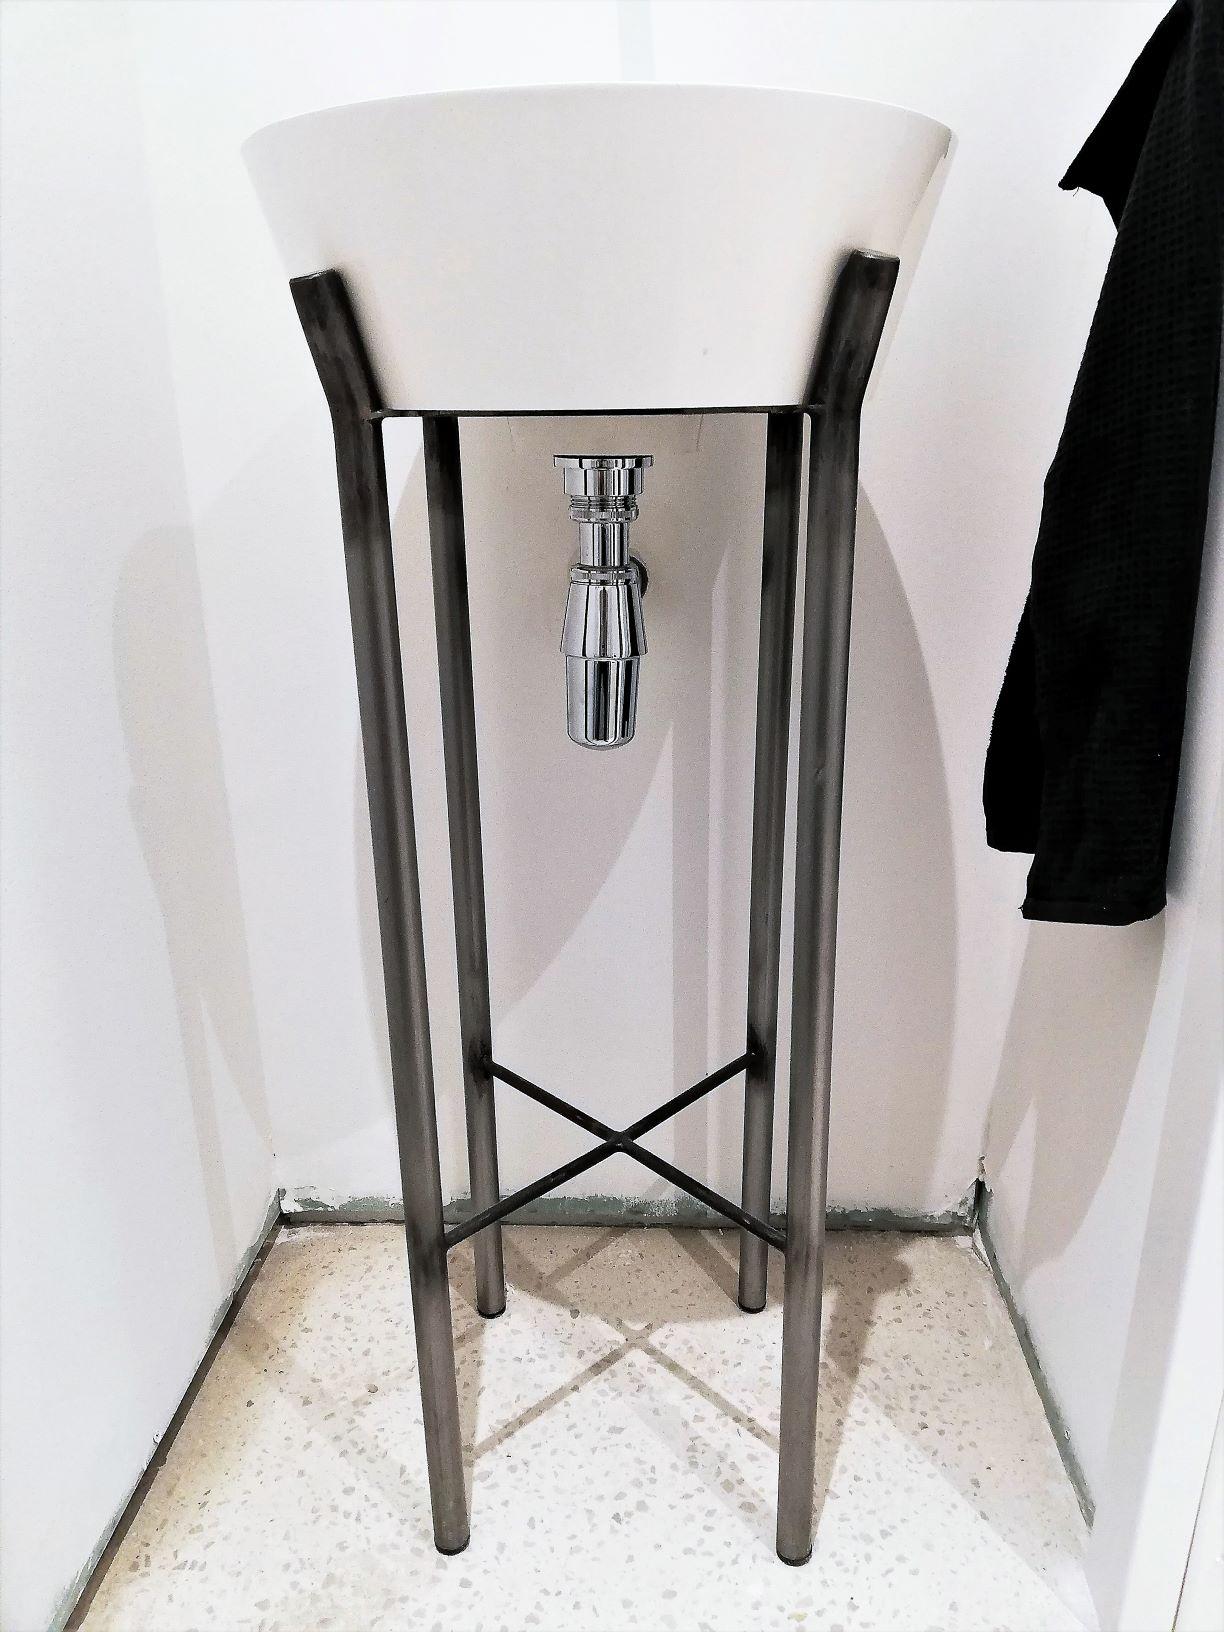 inxongo - support vasque acier 3R - ferronnier Marseille